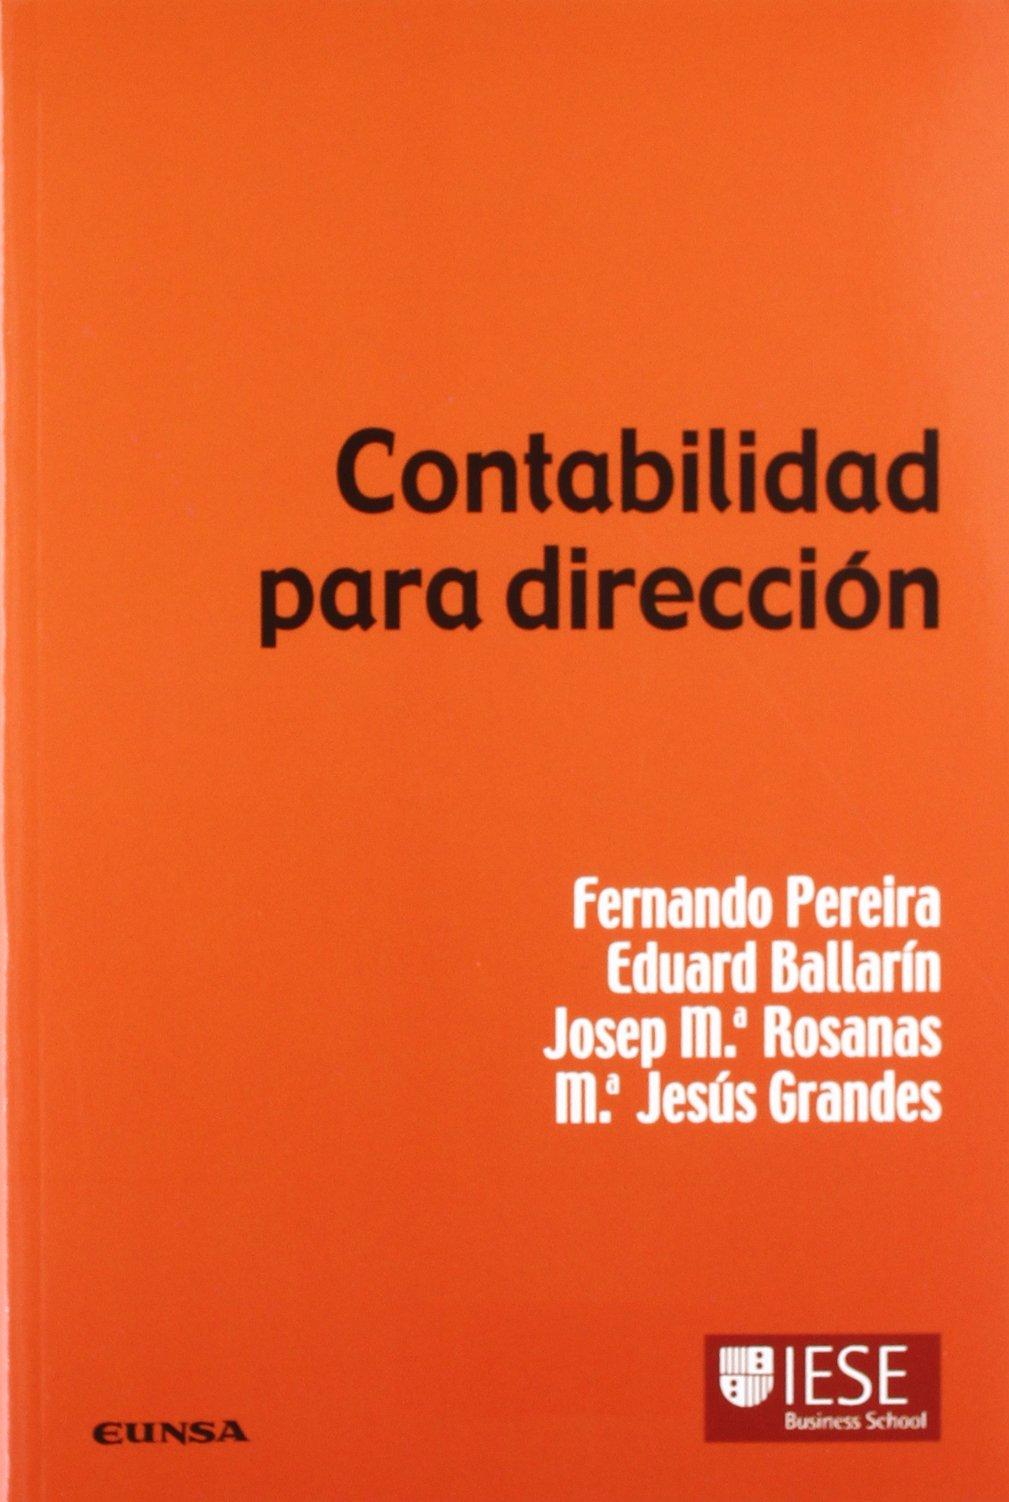 Libros farmacéuticos